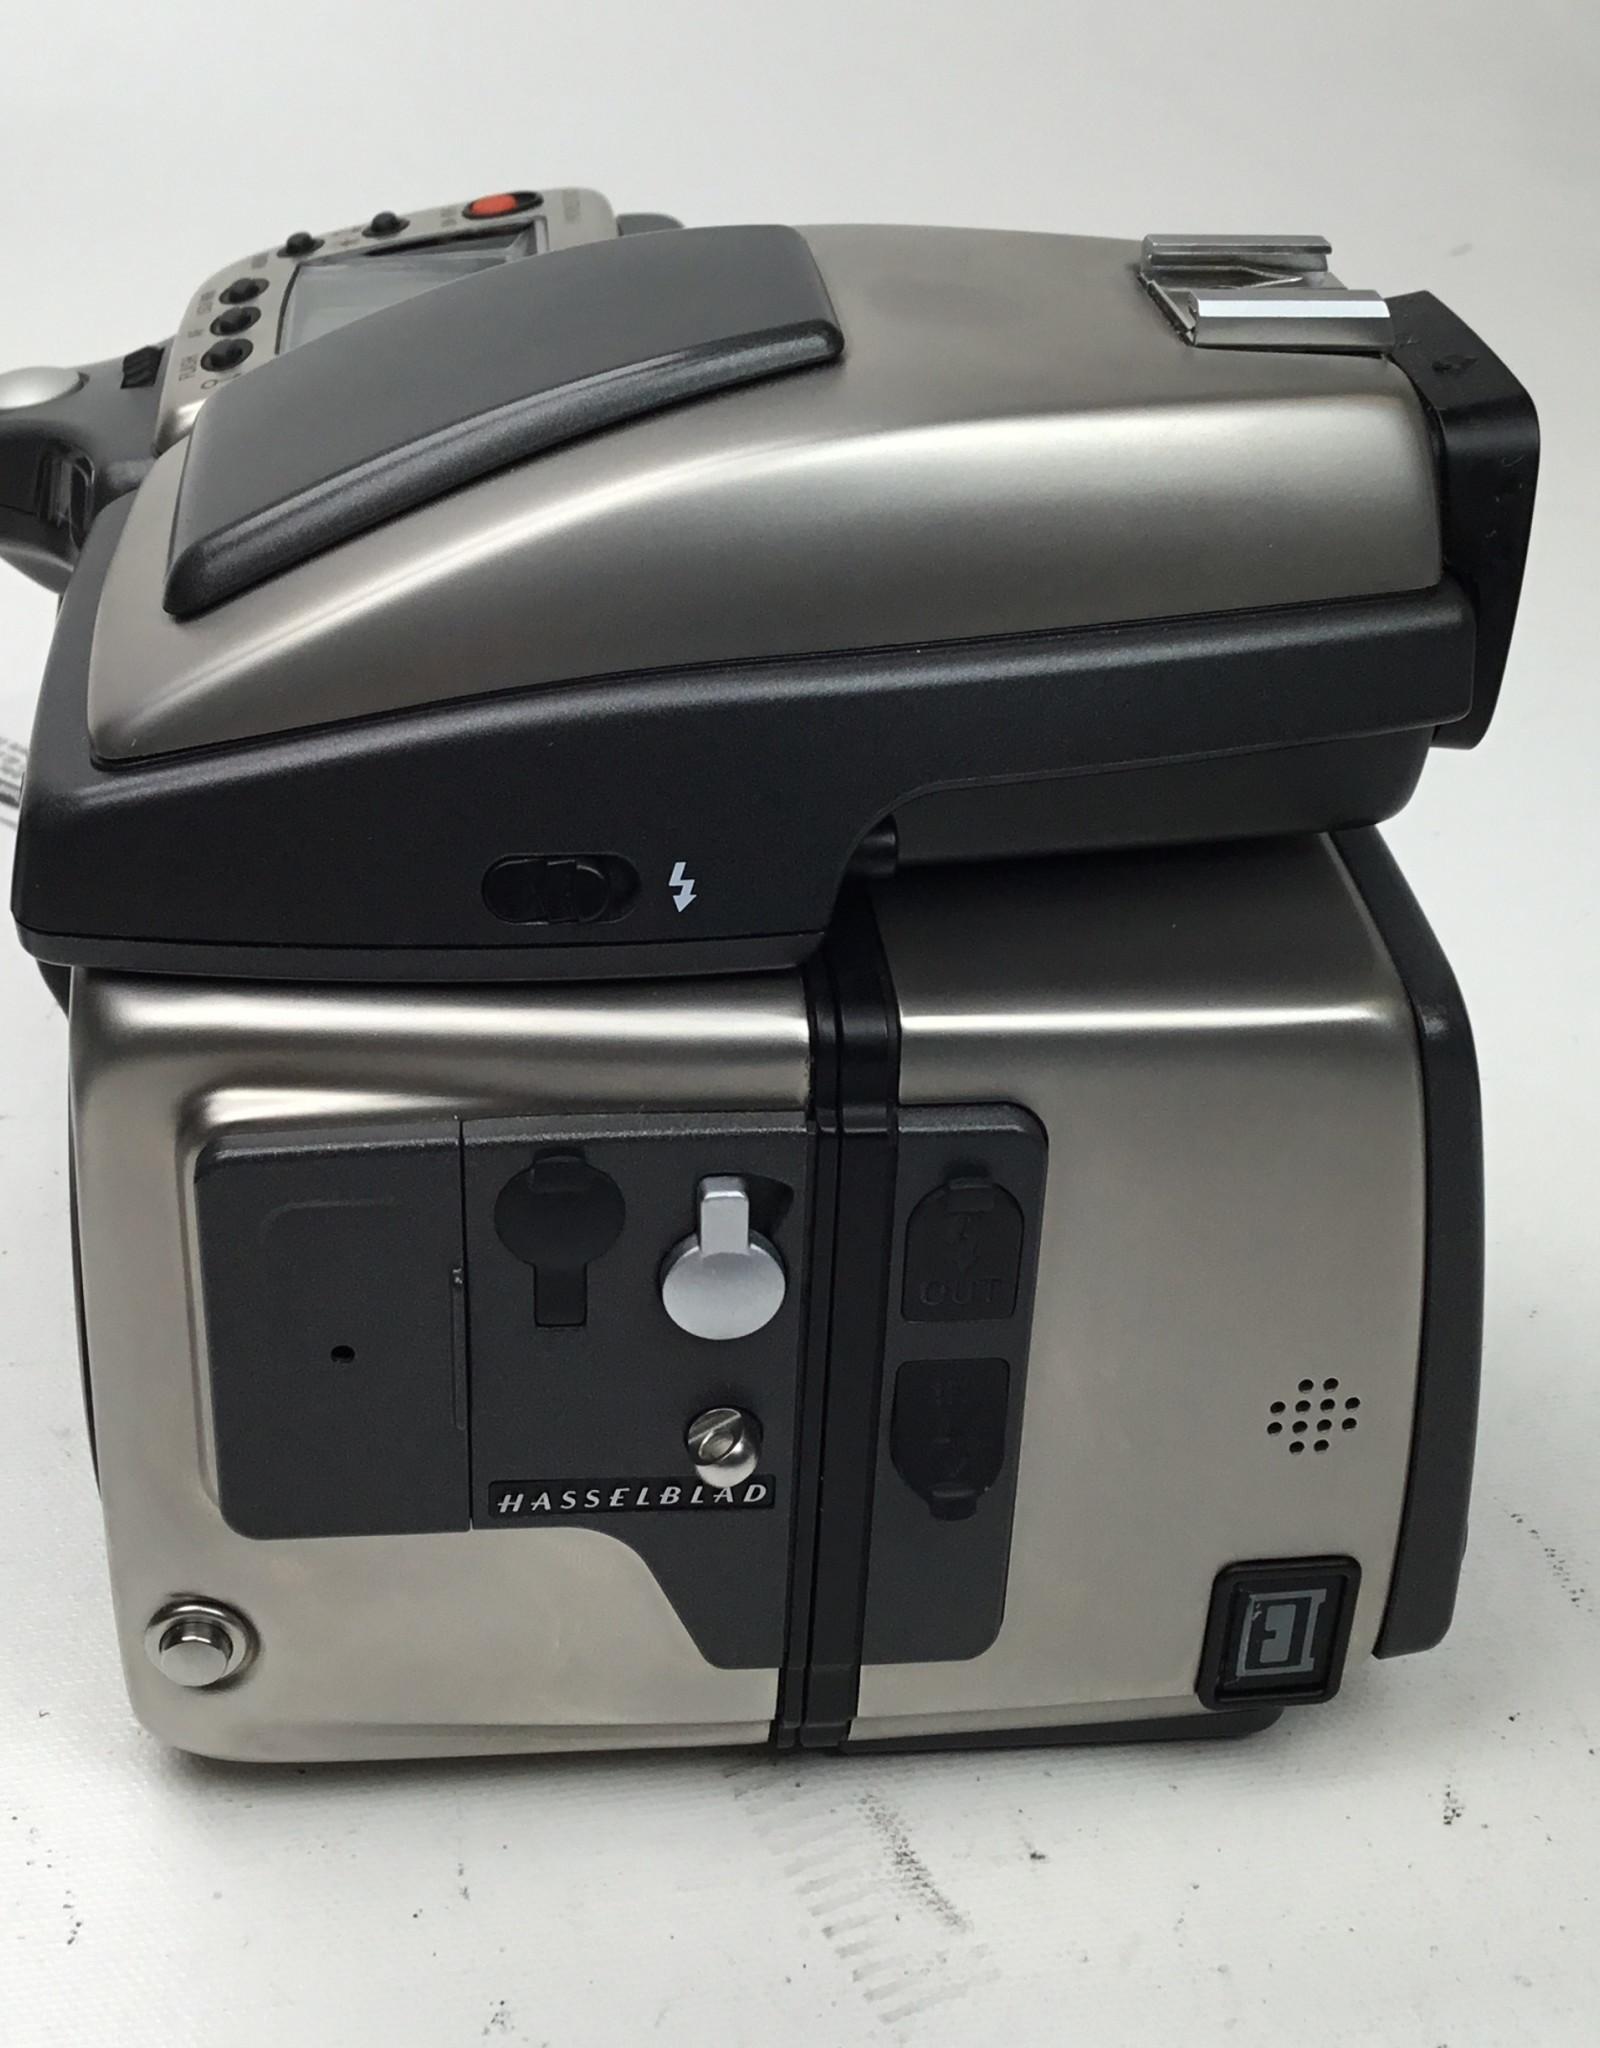 hasselblad Hasselblad H4D H4D-40 40.0MP Digital Camera Used Good